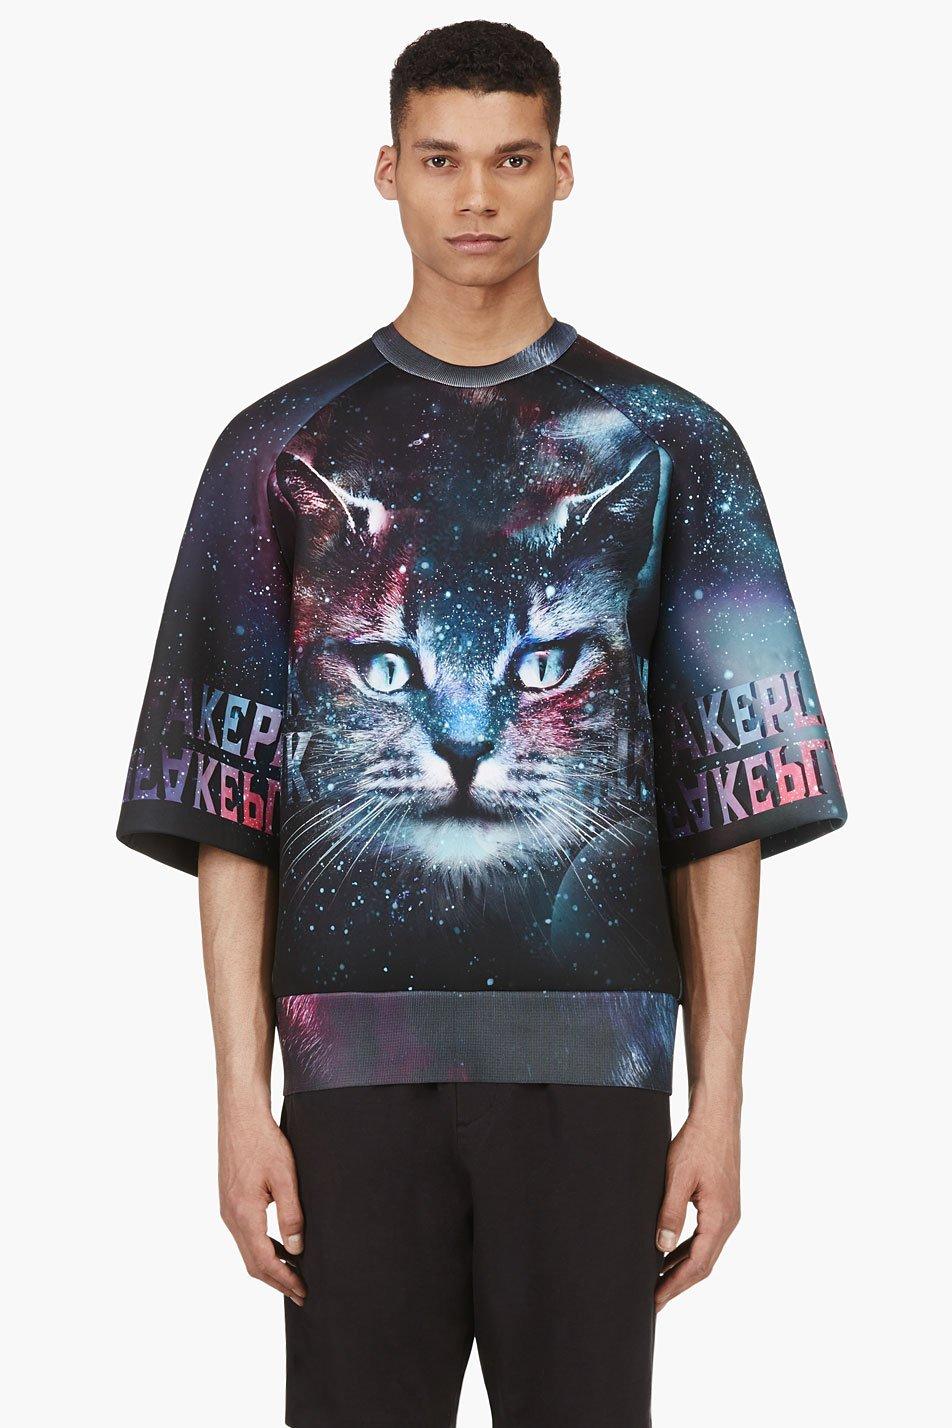 juun.j ssense exclusive purple and teal cosmic cat oversized shirt